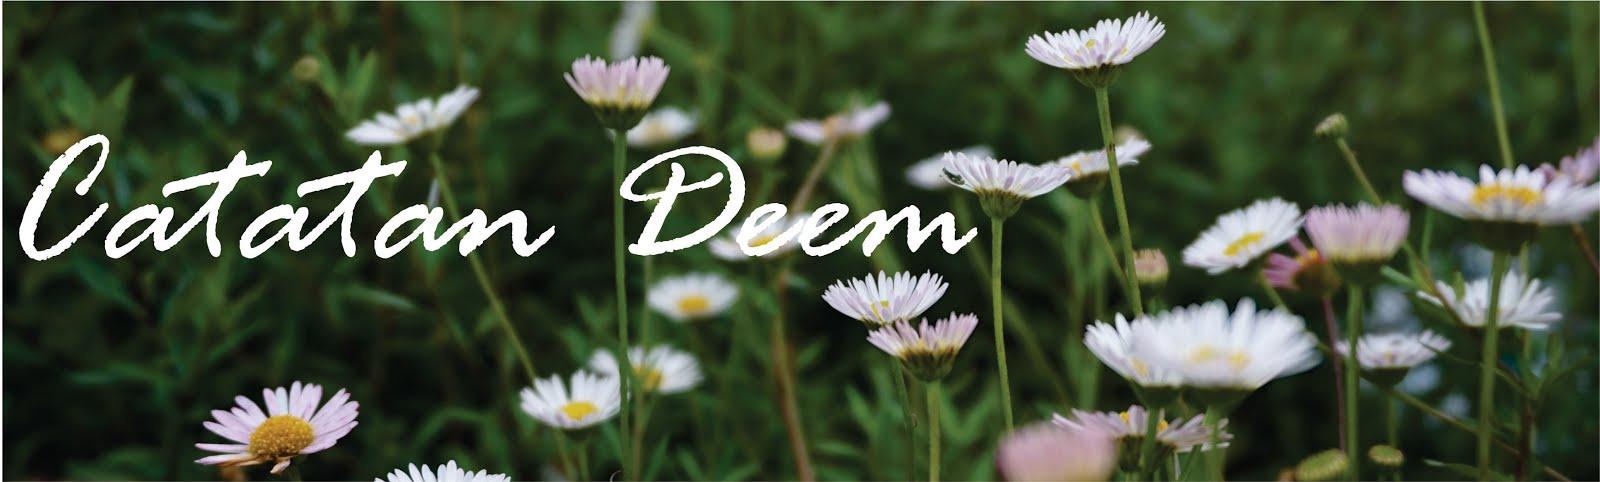 Catatan Deem